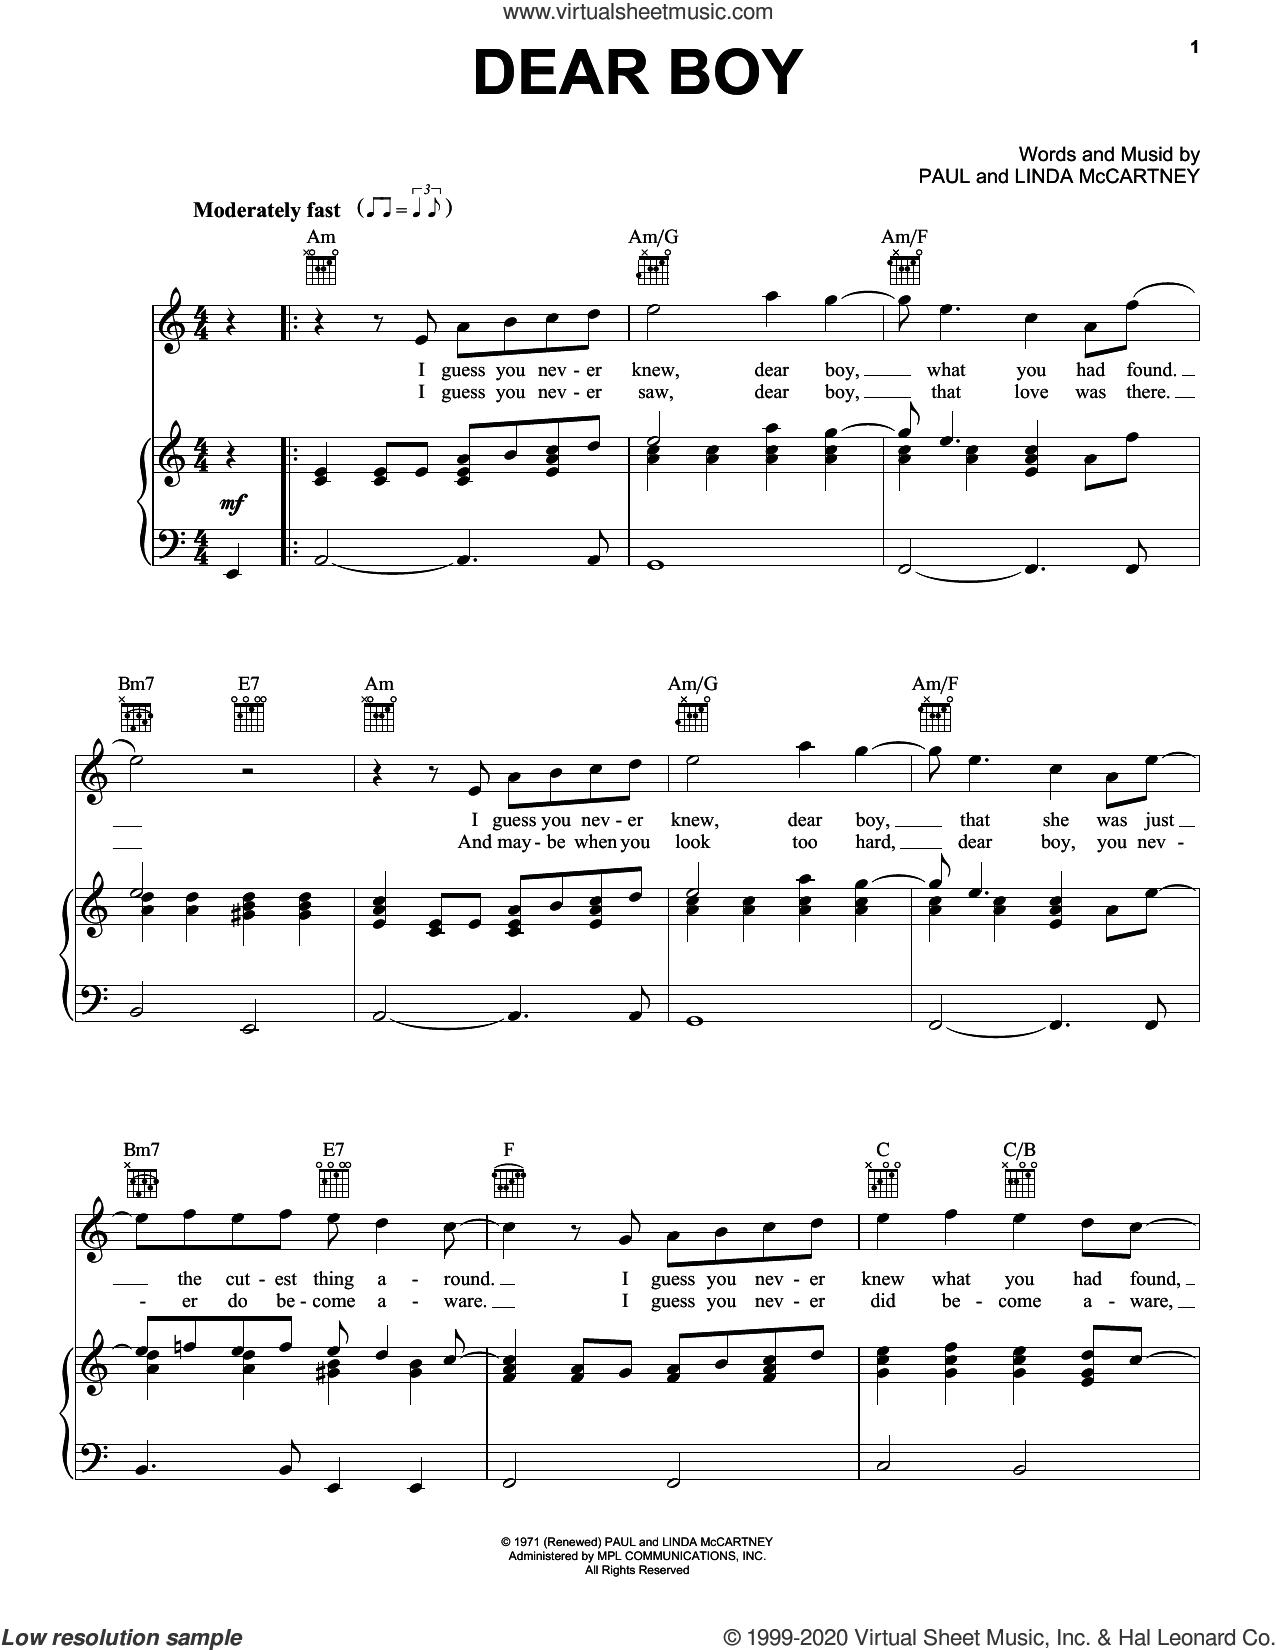 Dear Boy sheet music for voice, piano or guitar by Paul McCartney and Linda McCartney, intermediate skill level